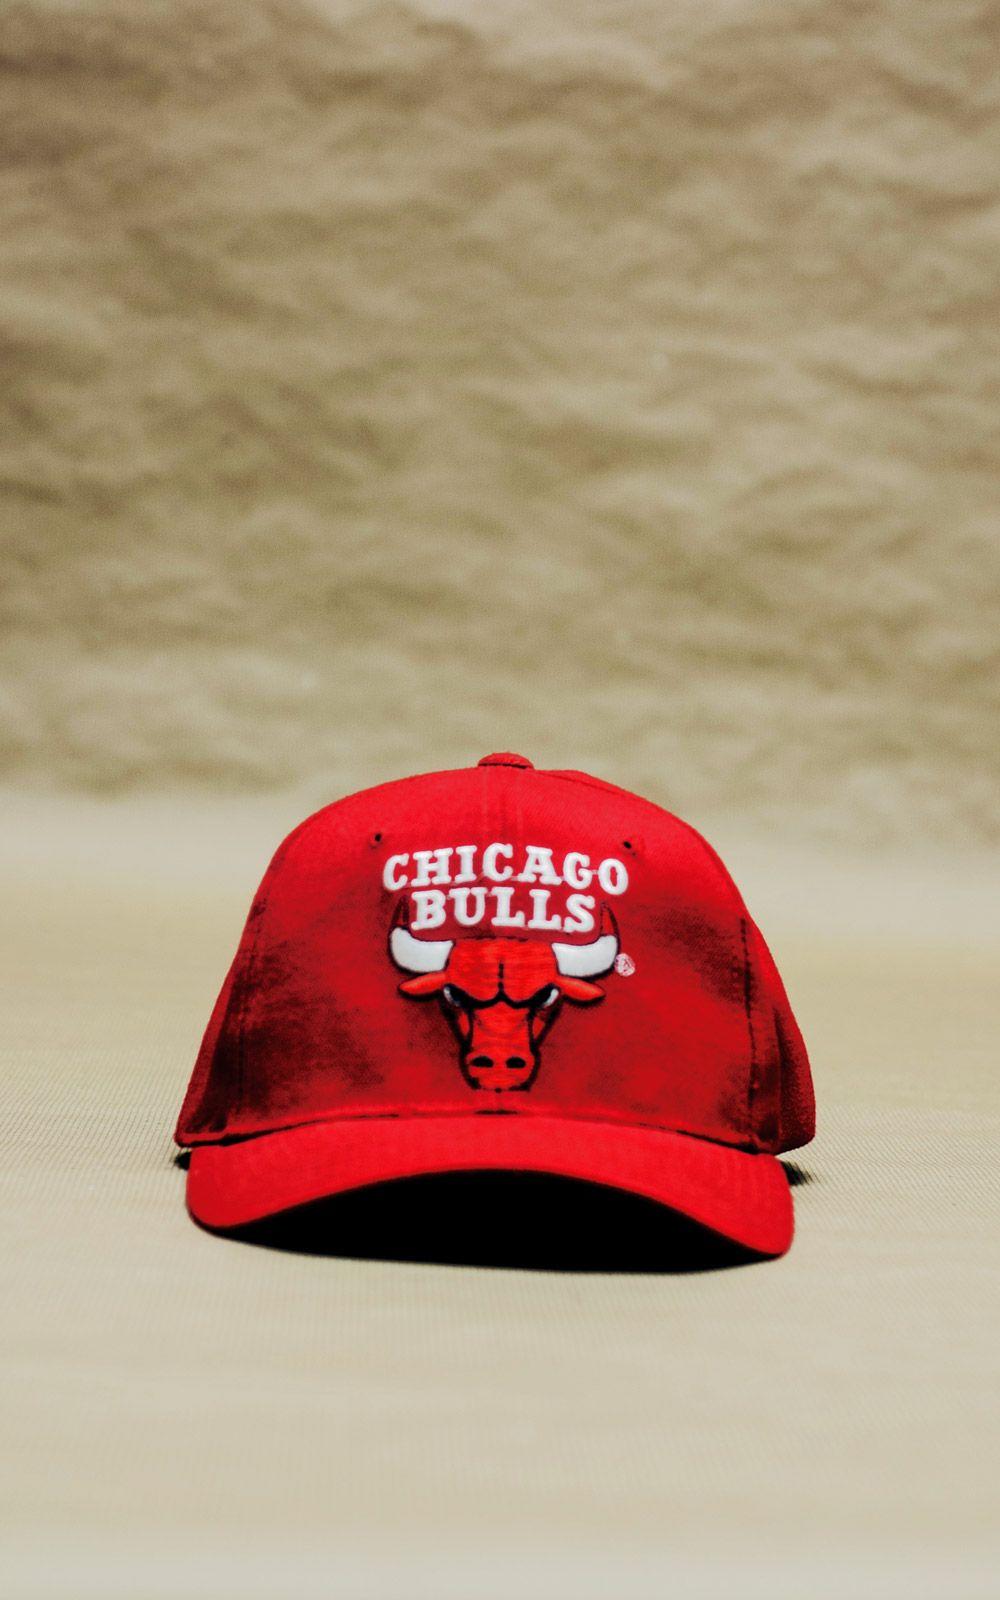 Chicago Cap Bulls Wallpaper For IPhone